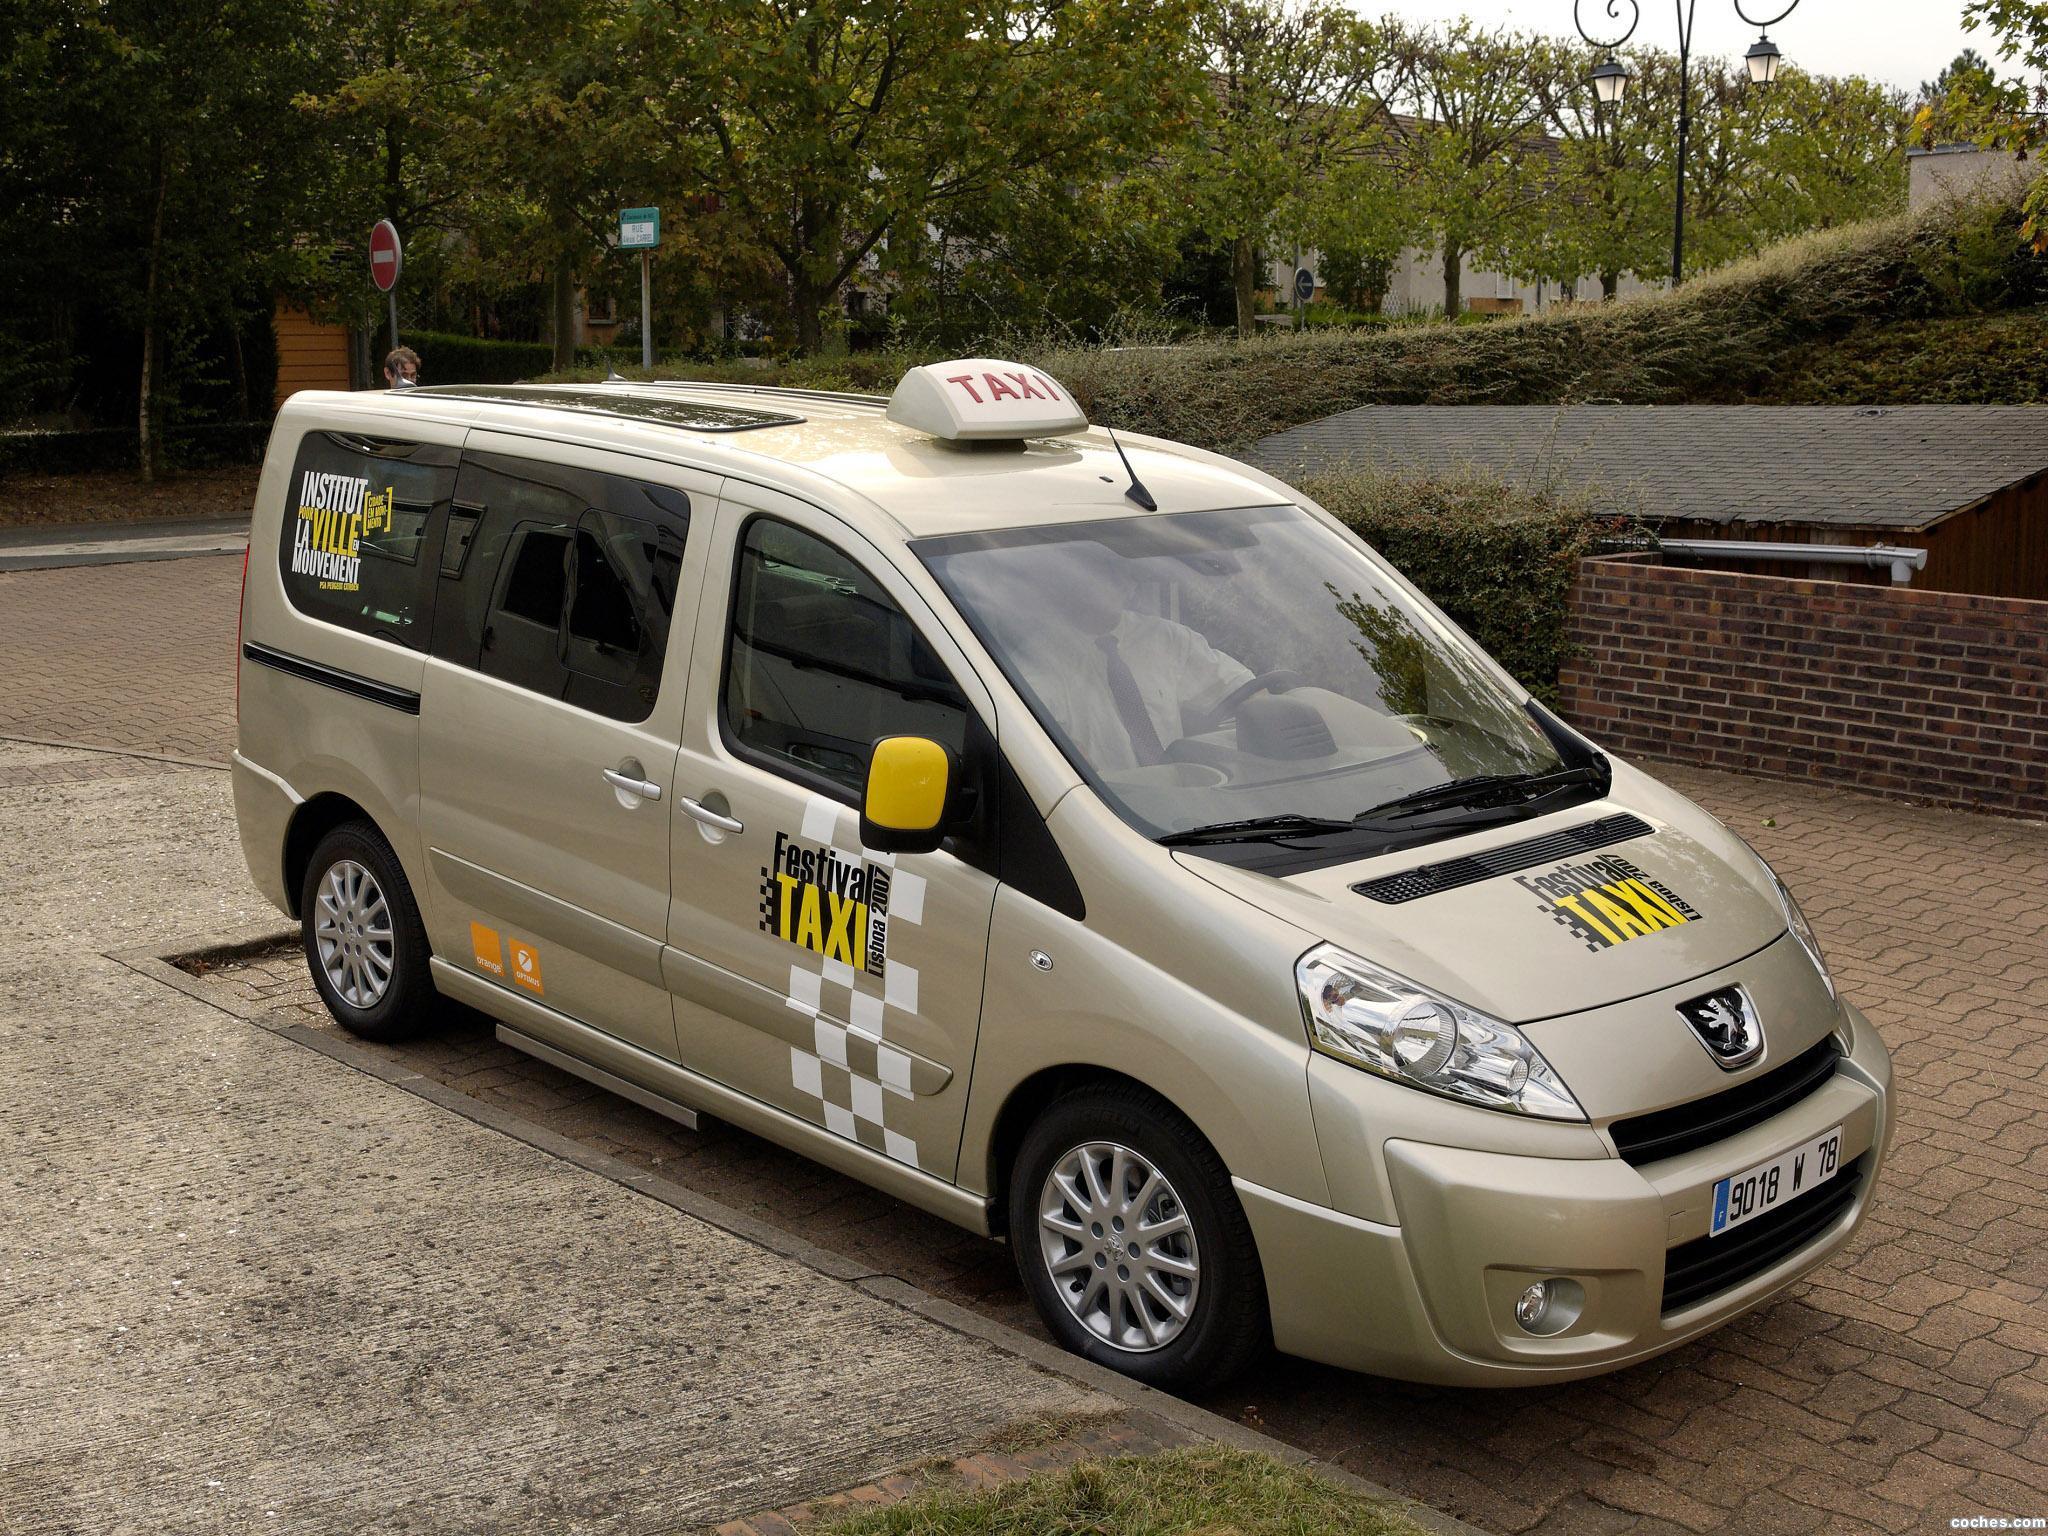 peugeot_expert-tepee-taxi-2007-12_r2